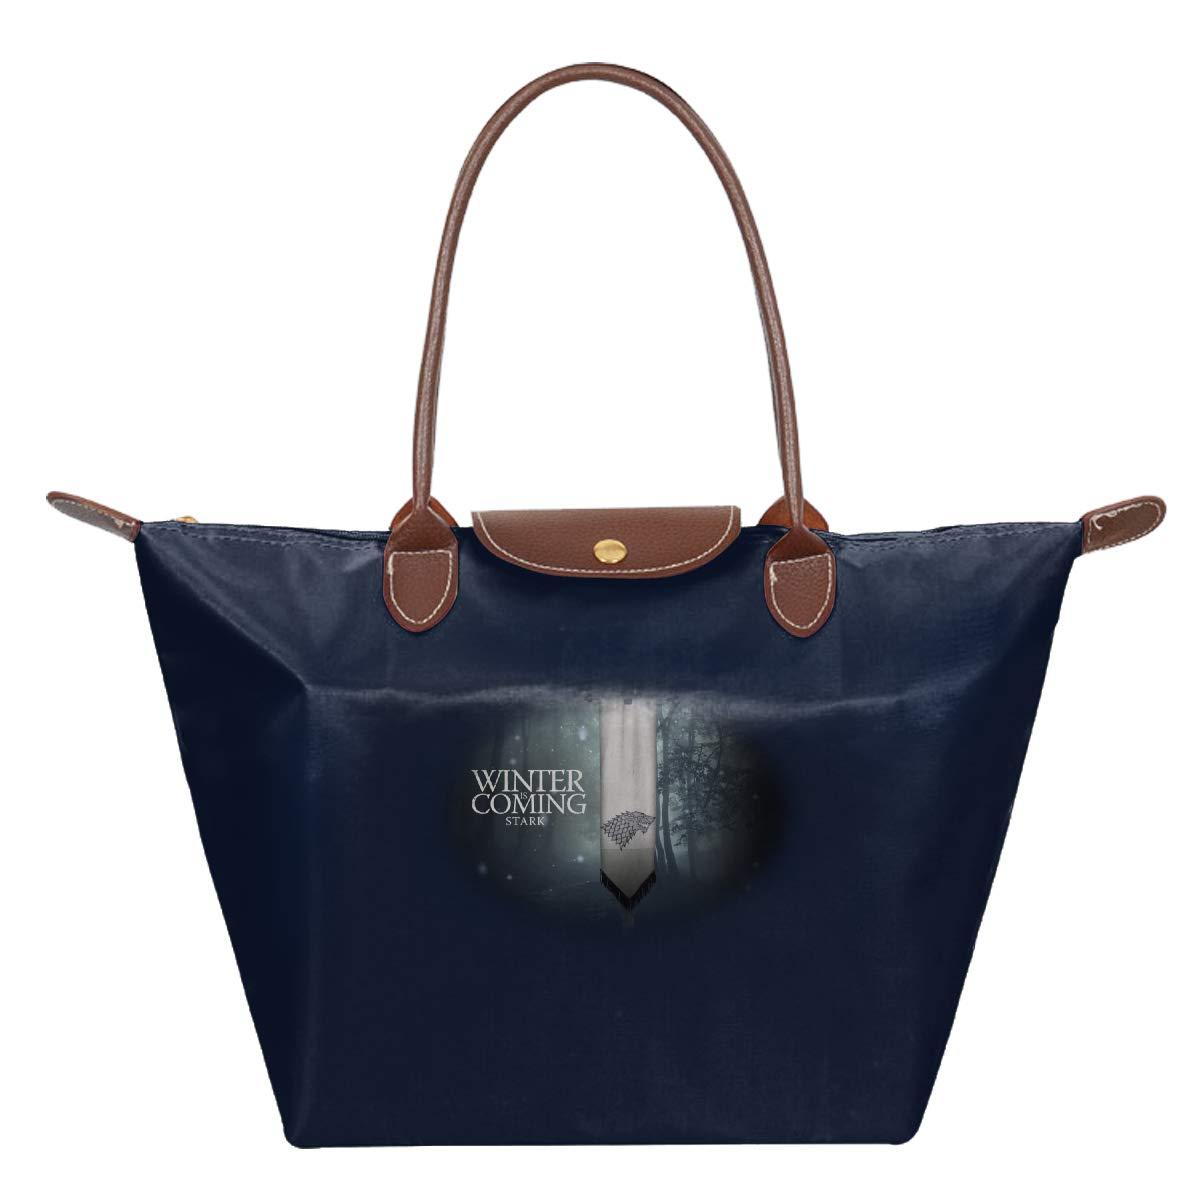 Mother Of Dragons GOT TV Game Of Thrones Winter Is Coming Stark Waterproof Leather Folded Messenger Nylon Bag Travel Tote Hopping Folding School Handbags